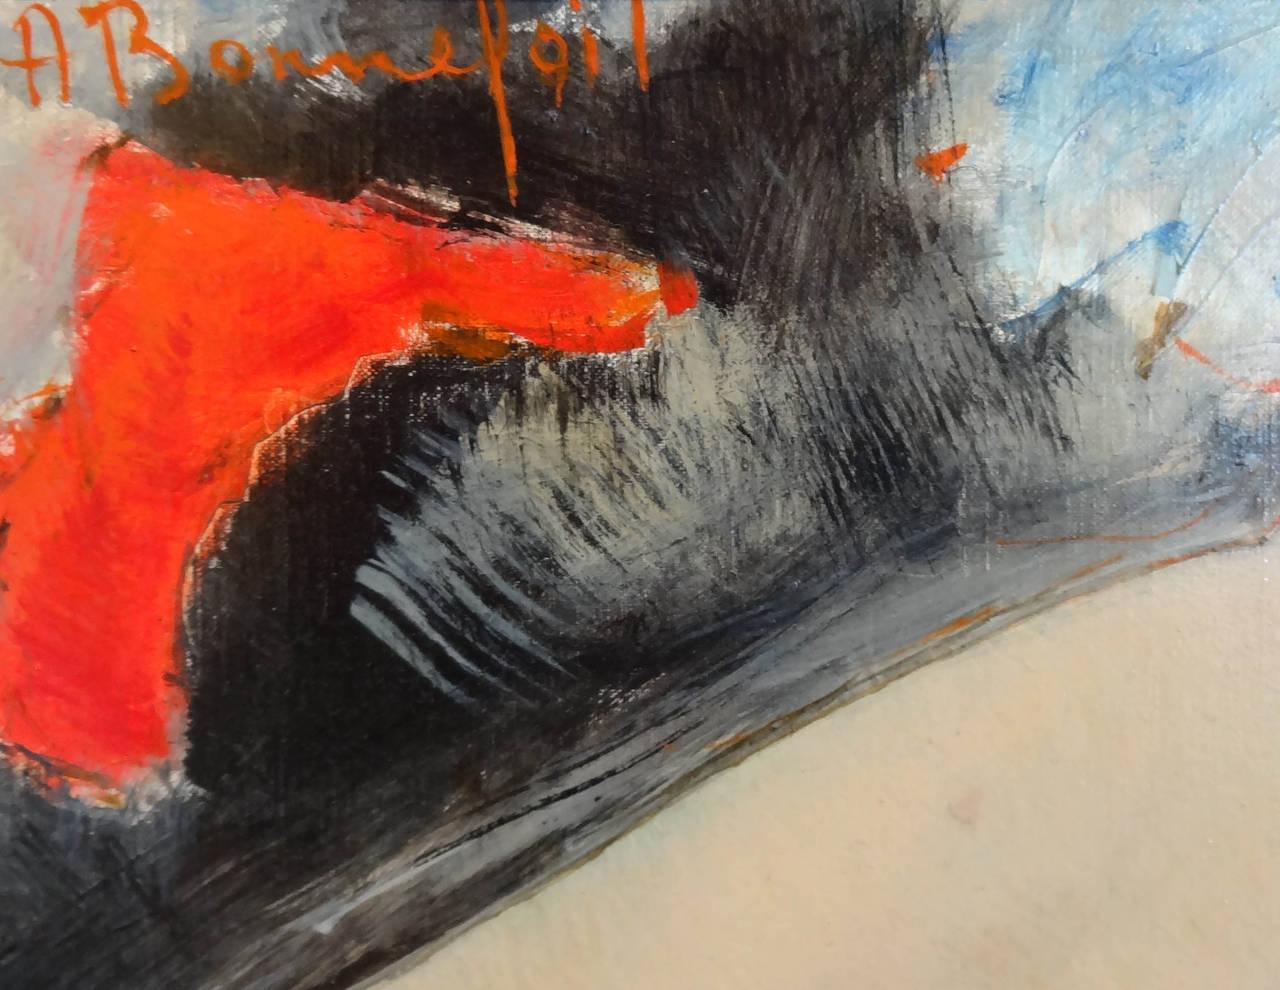 Glamour - Impressionist Painting by Alain Bonnefoit